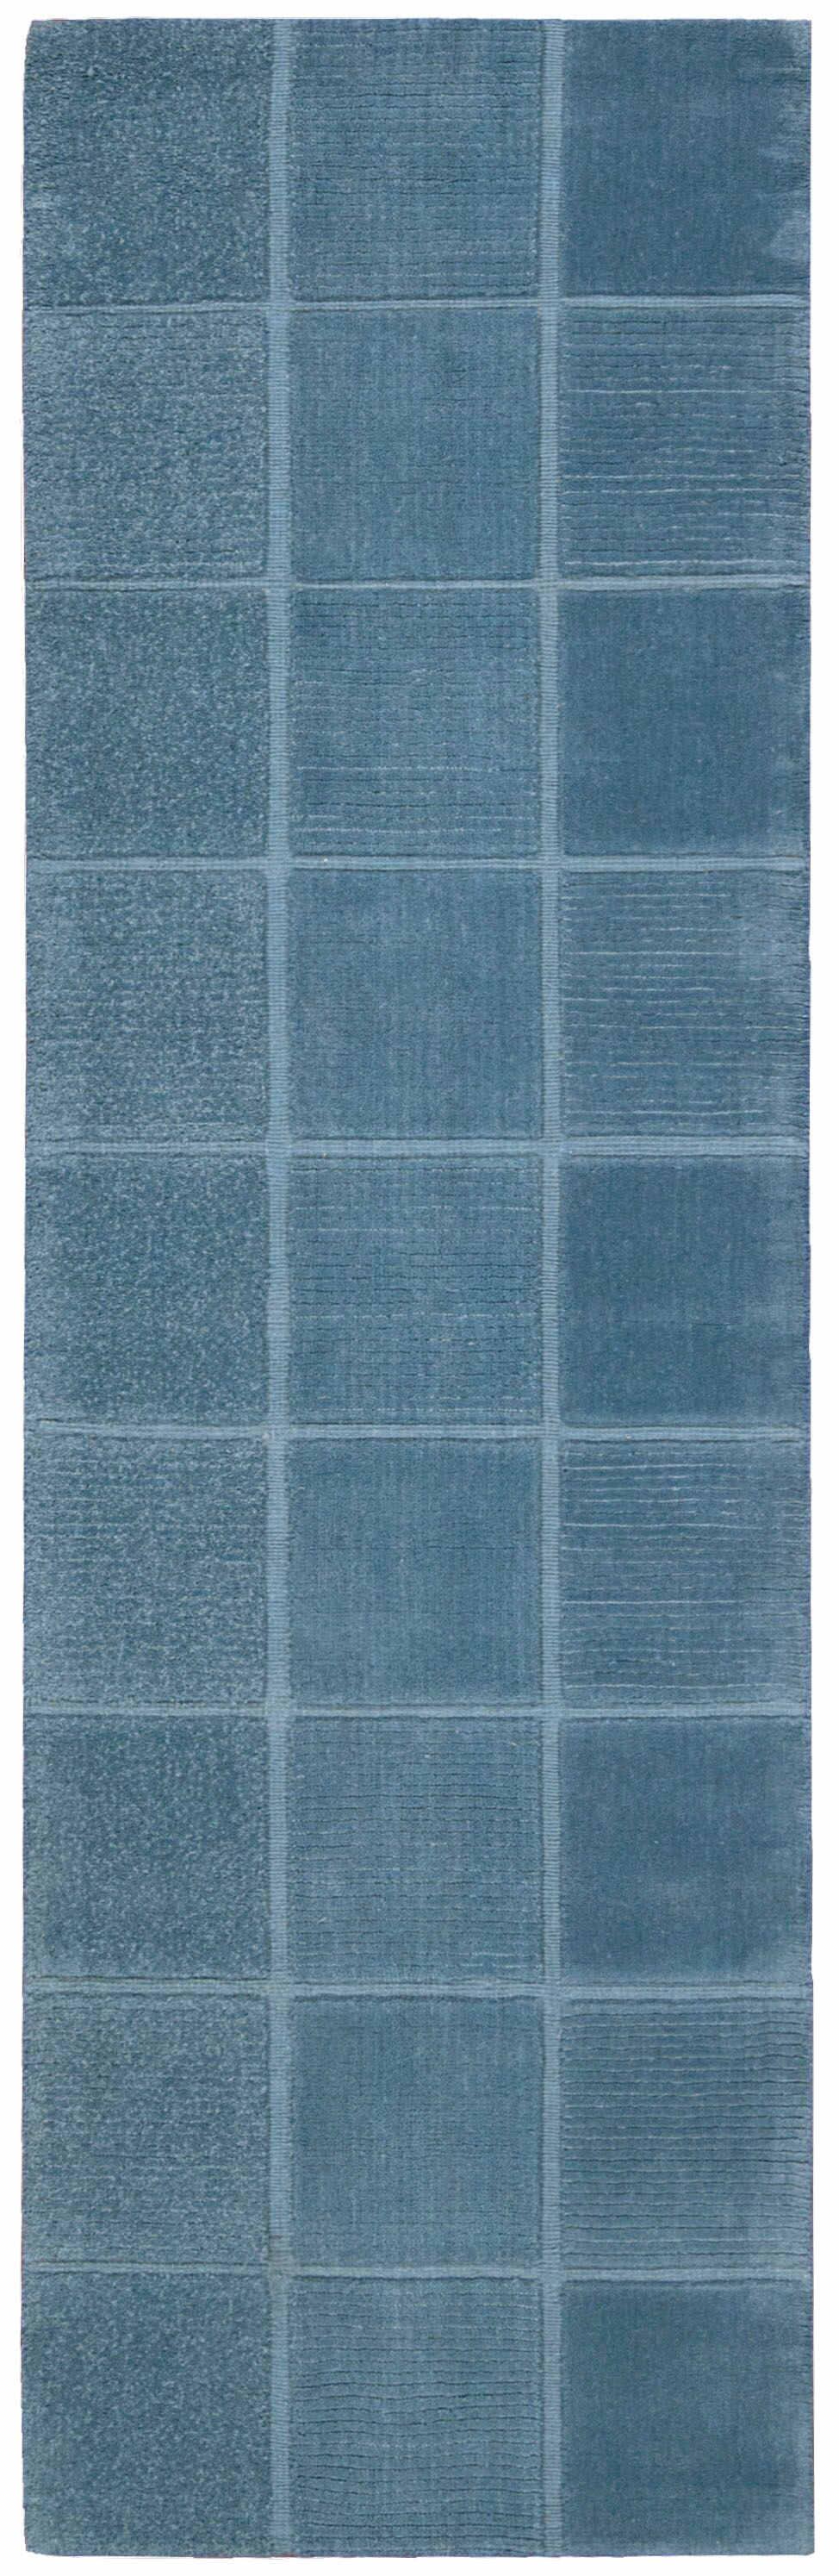 Westport Hand Woven Blue Area Rugs